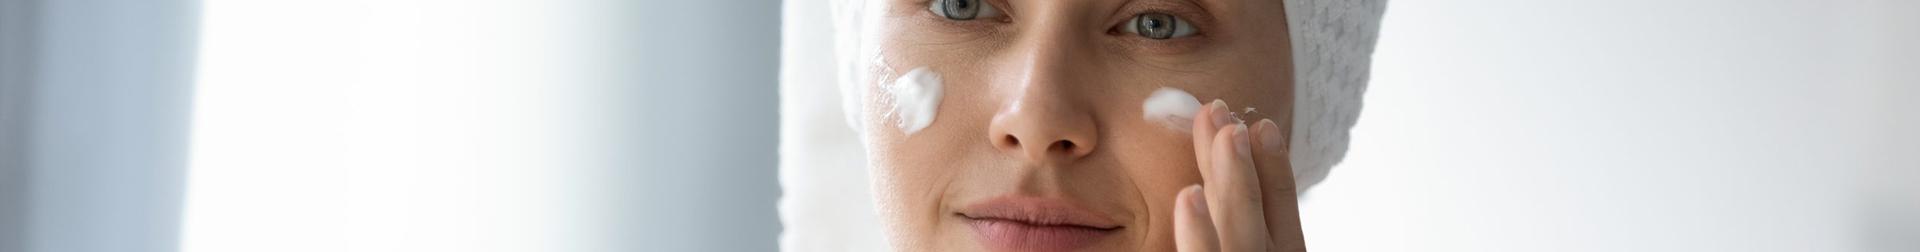 Makeup Products | Buy Best Face Primer Online | AromaCraze